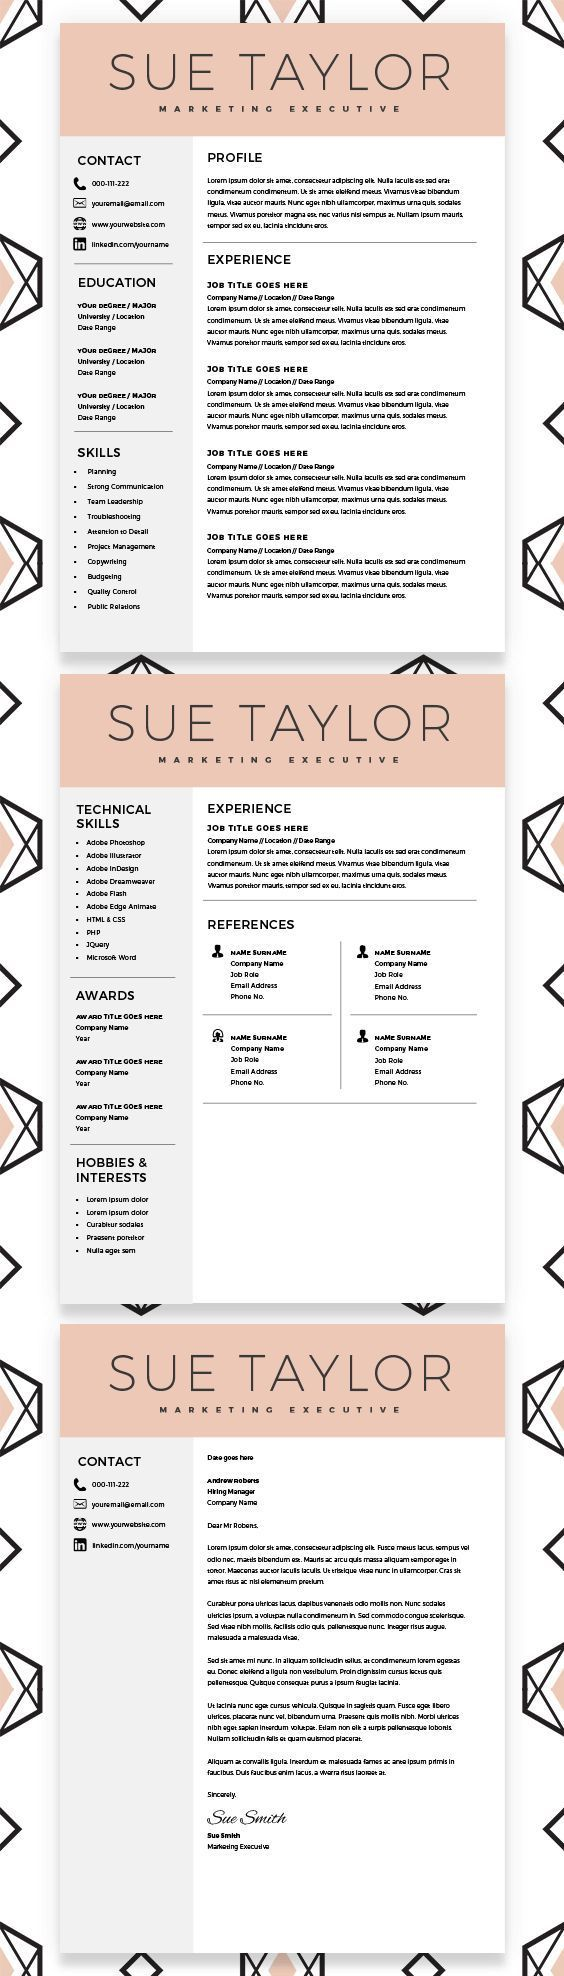 marketing executive resume  modern resume template  cv template  word resume  professional